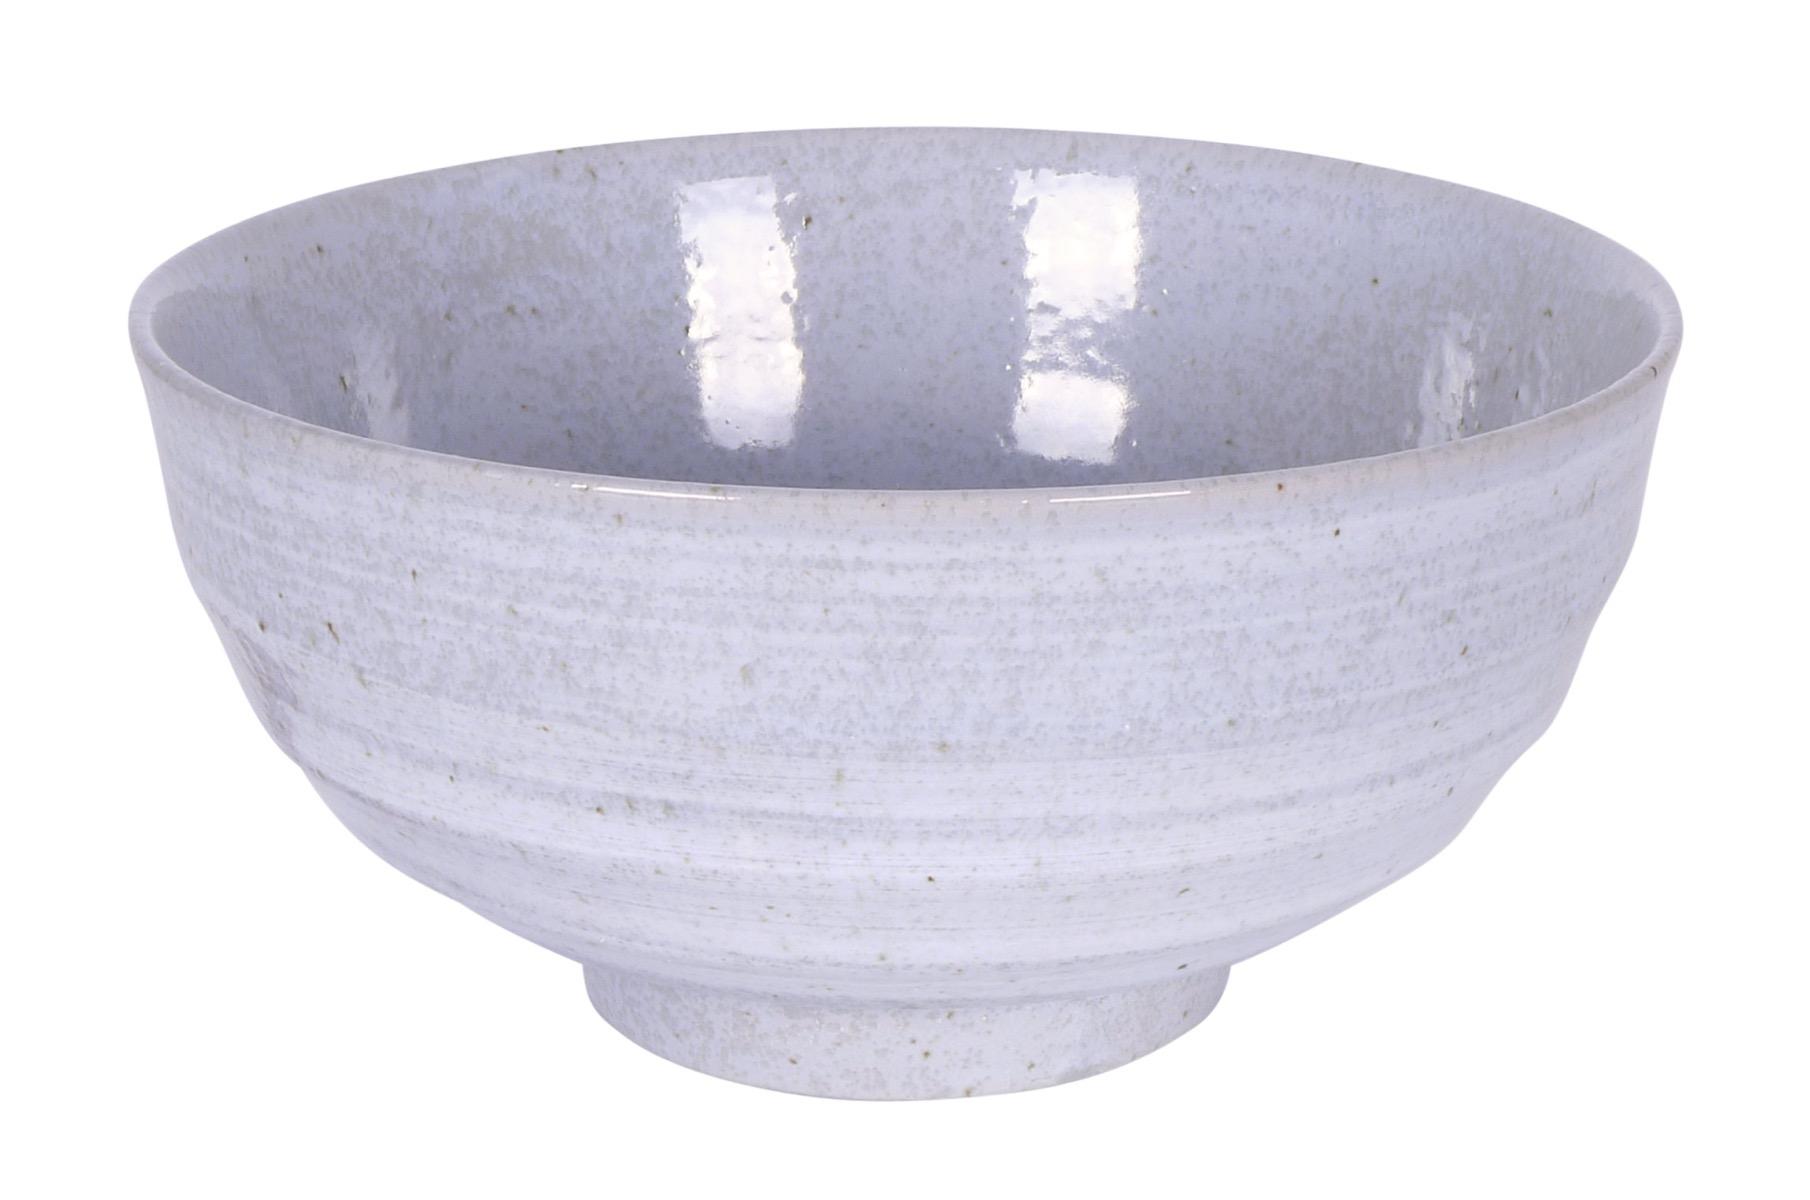 Image of Stoneware Bowls, Gray, 6.75 x 3.25-Inch